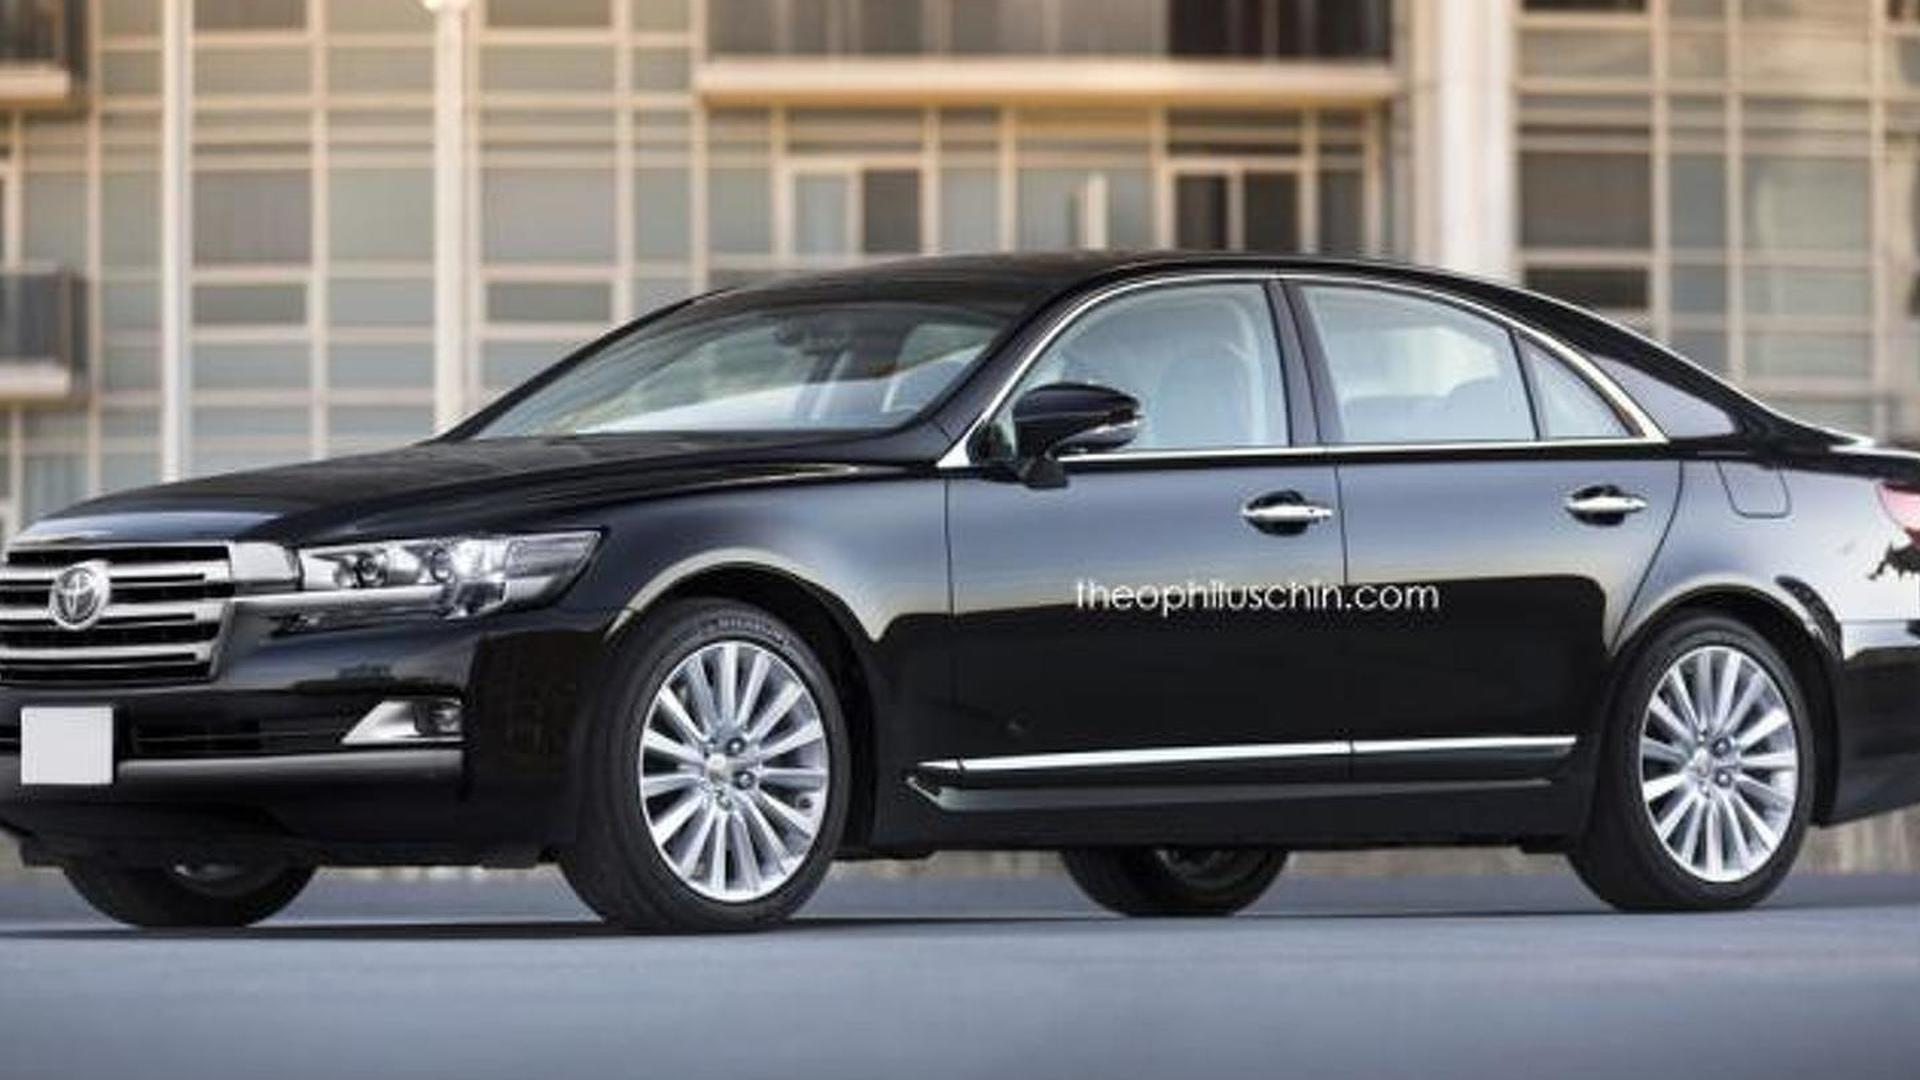 Toyota, Scion and Volkswagen Dealer ... - Crown Automotive